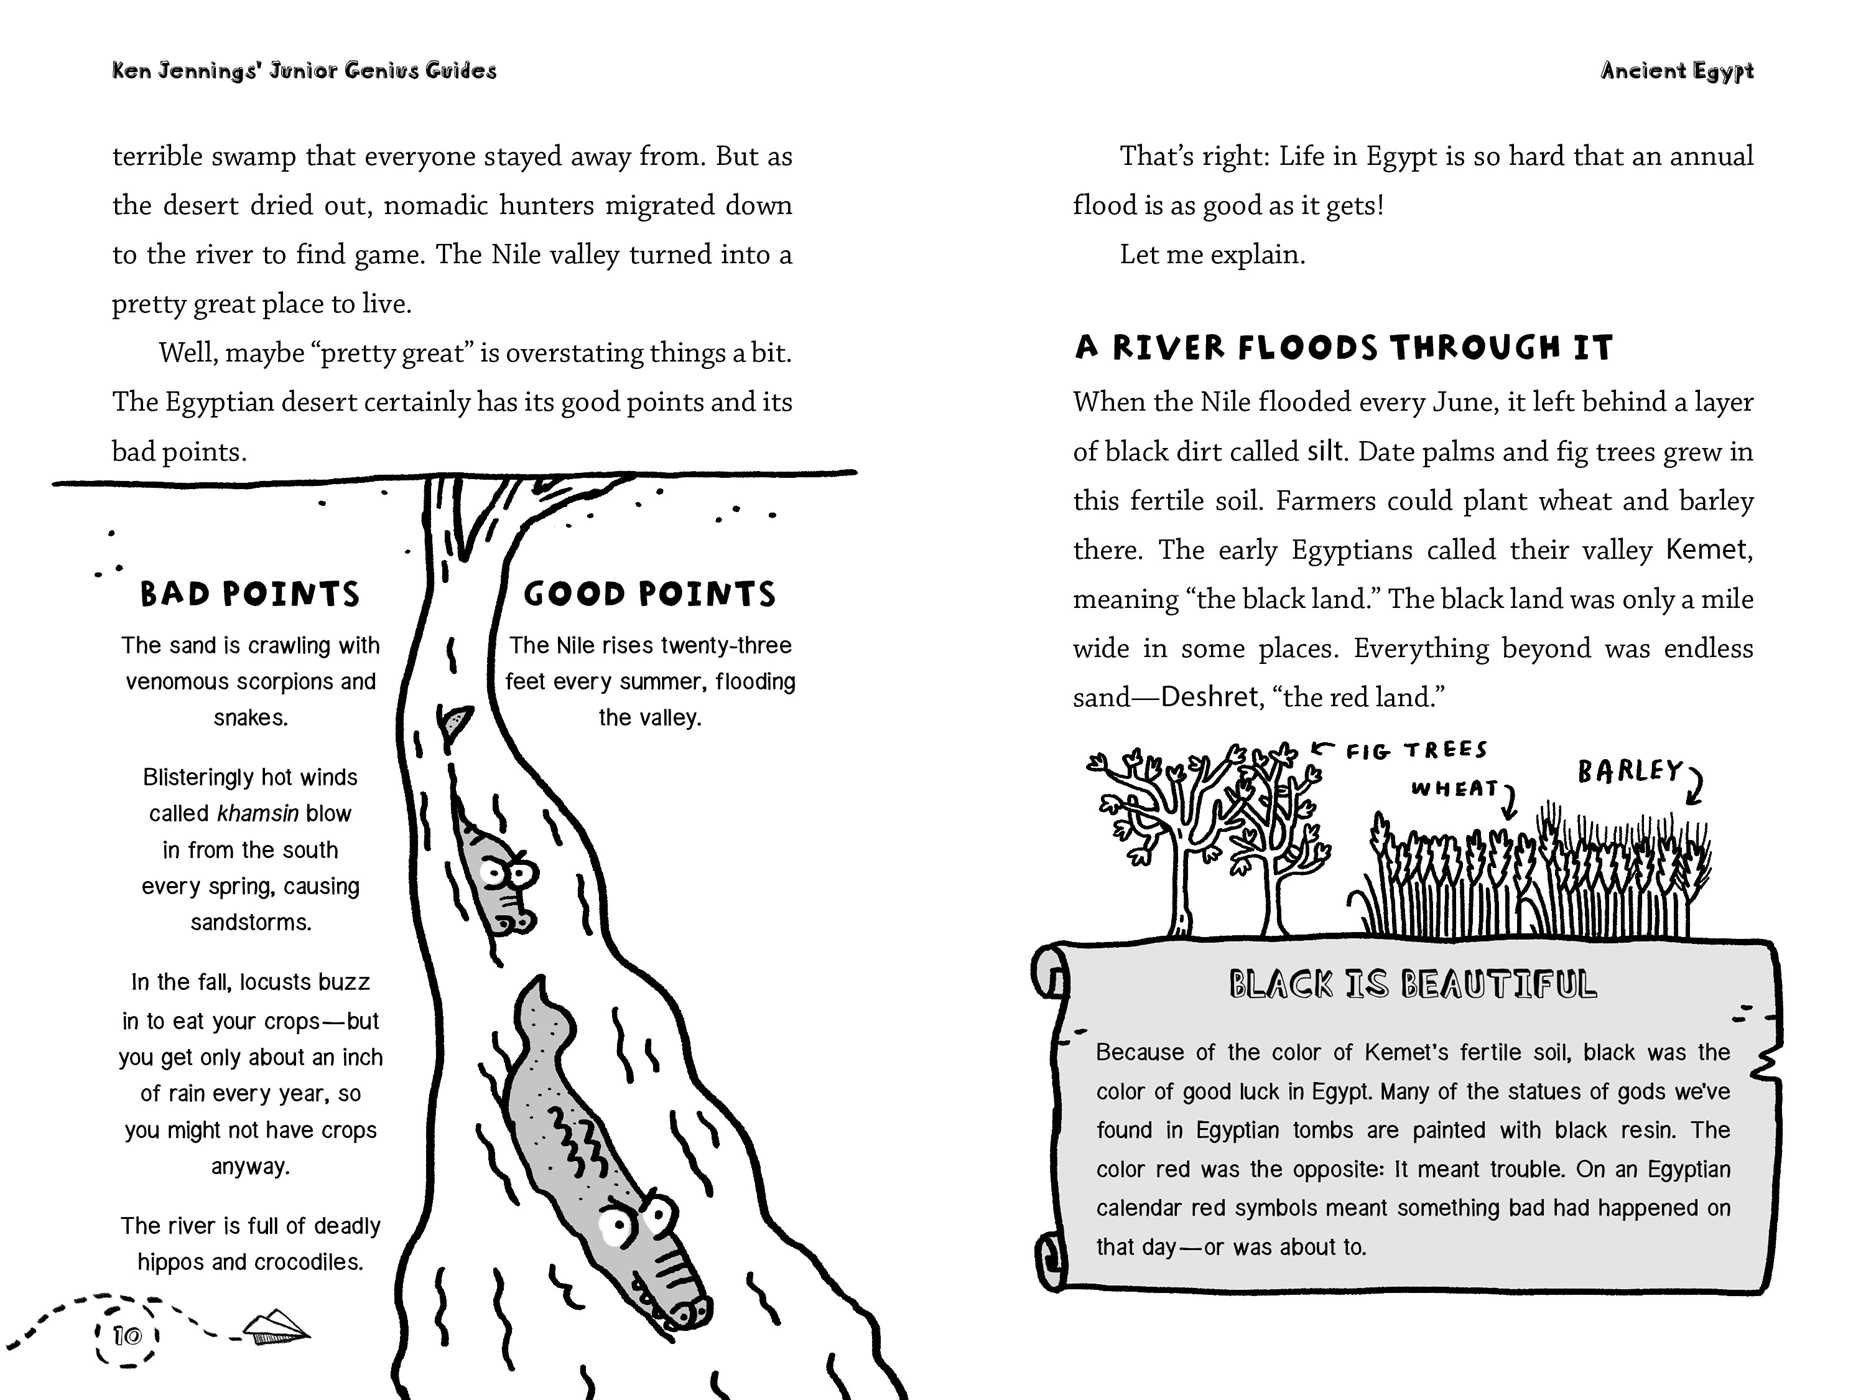 Amazon Ancient Egypt Ken Jennings Junior Genius Guides